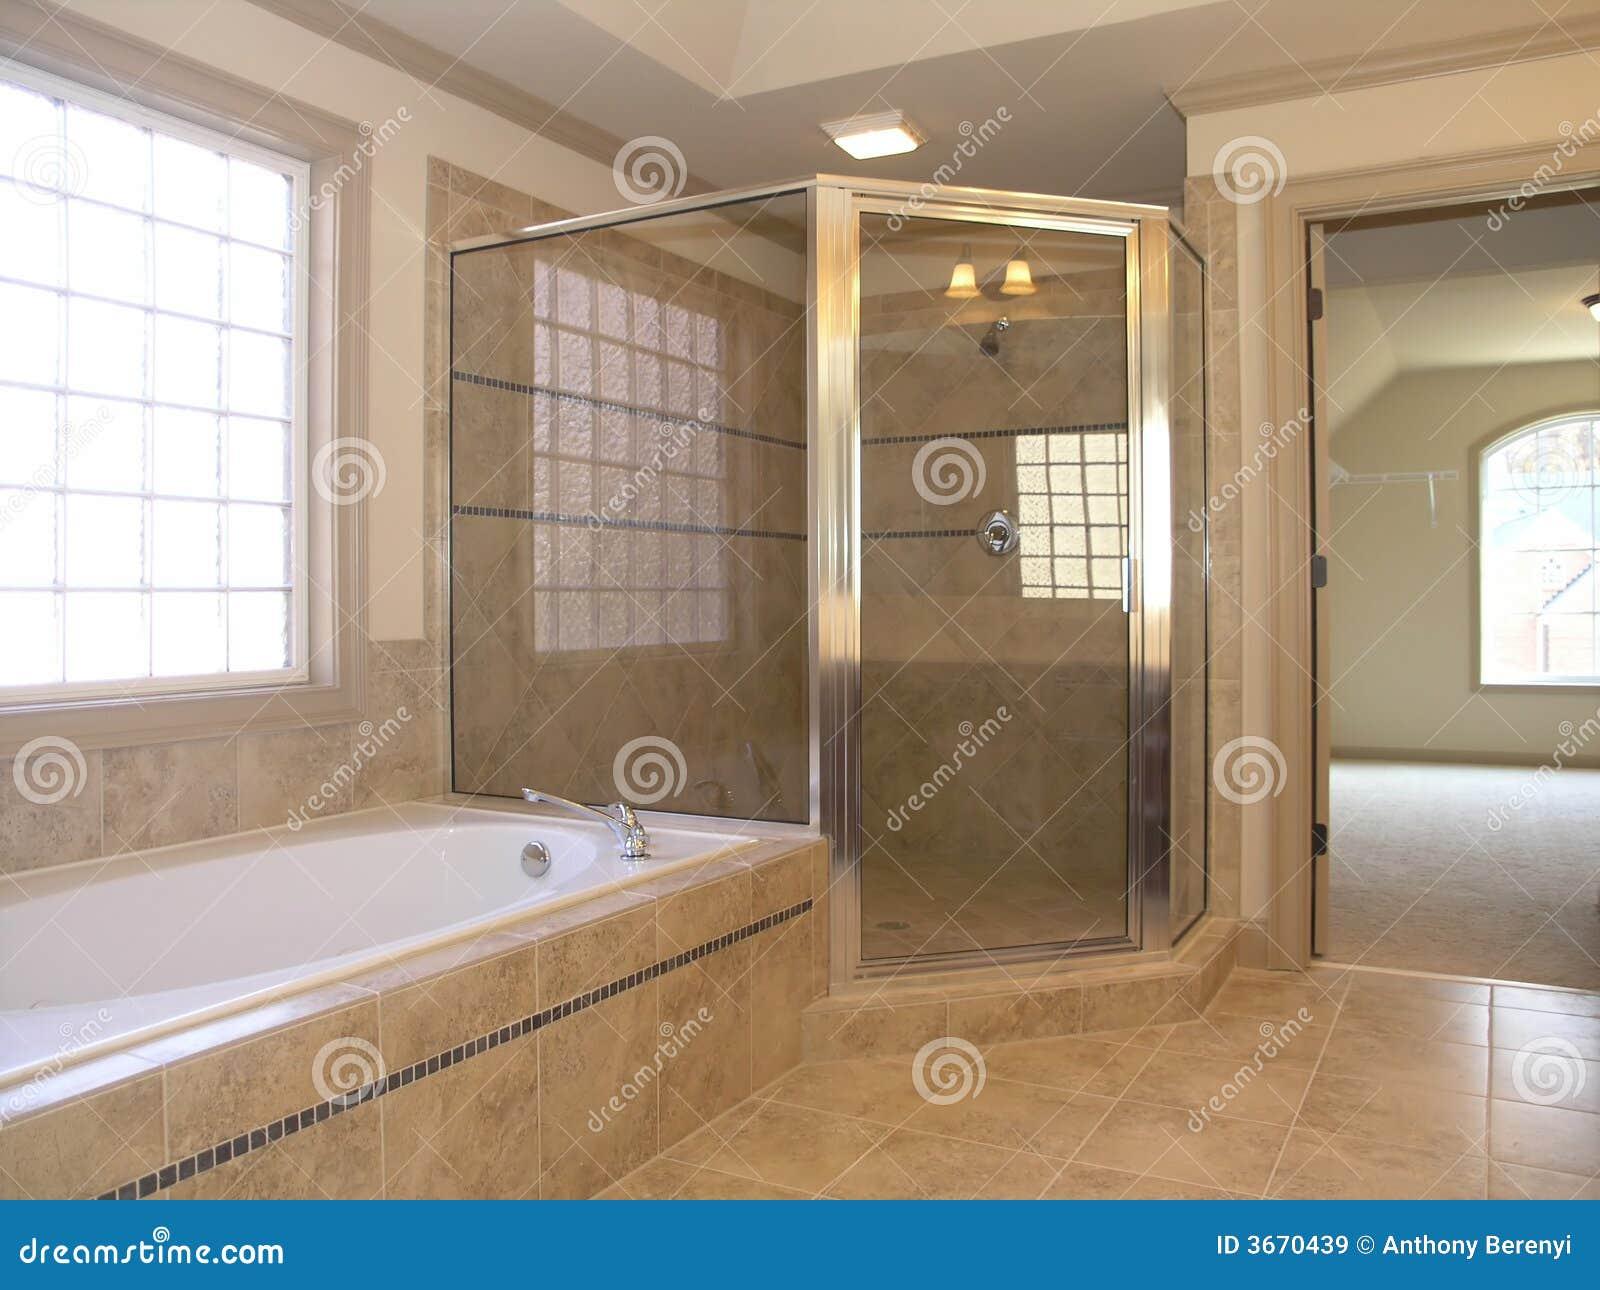 chuveiro luxuoso da cuba do banheiro imagens de stock. Black Bedroom Furniture Sets. Home Design Ideas